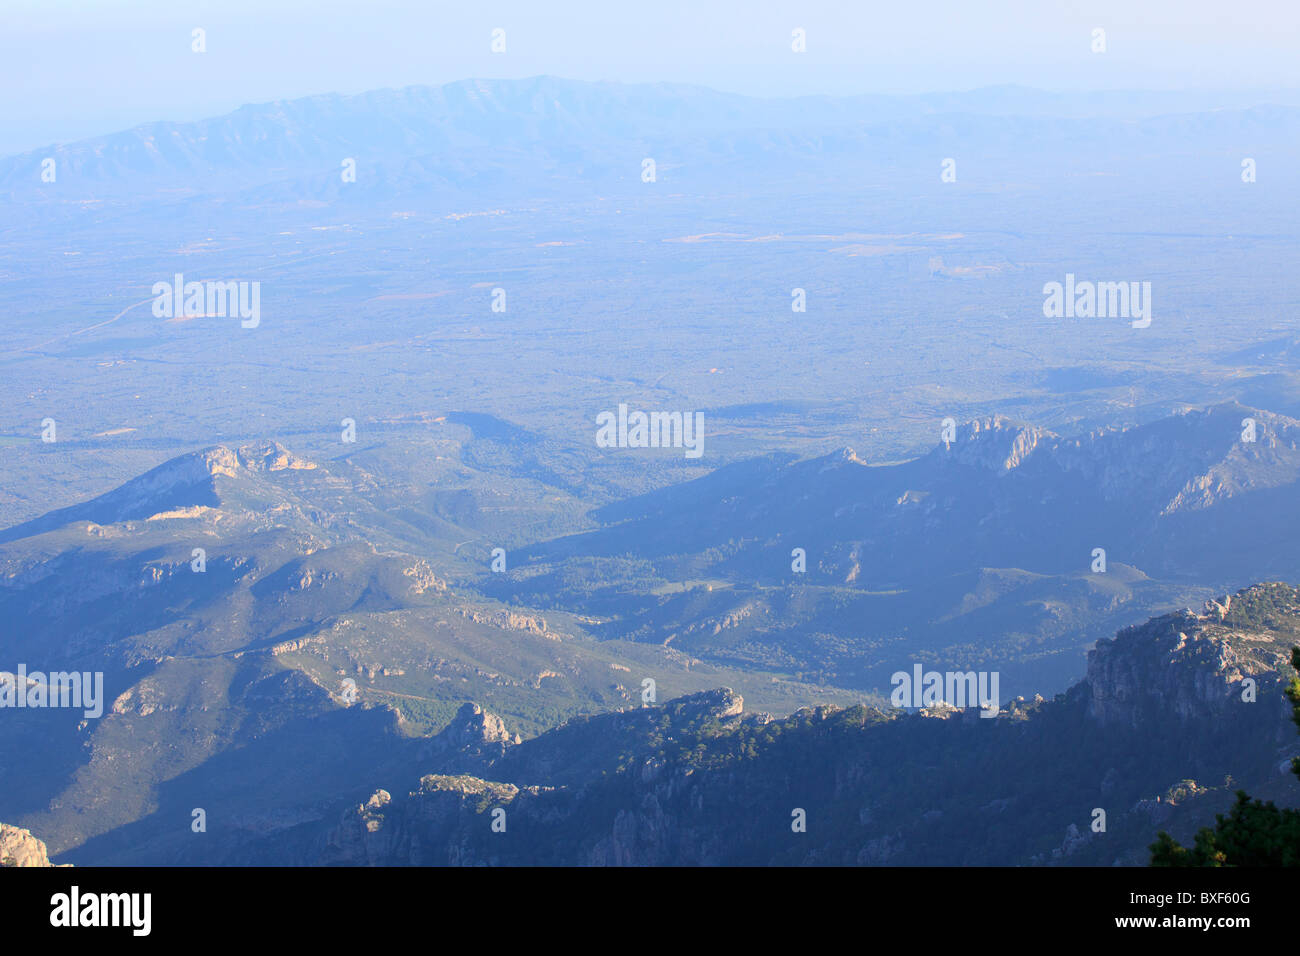 Els Ports natural park Catalonia Spain - Stock Image